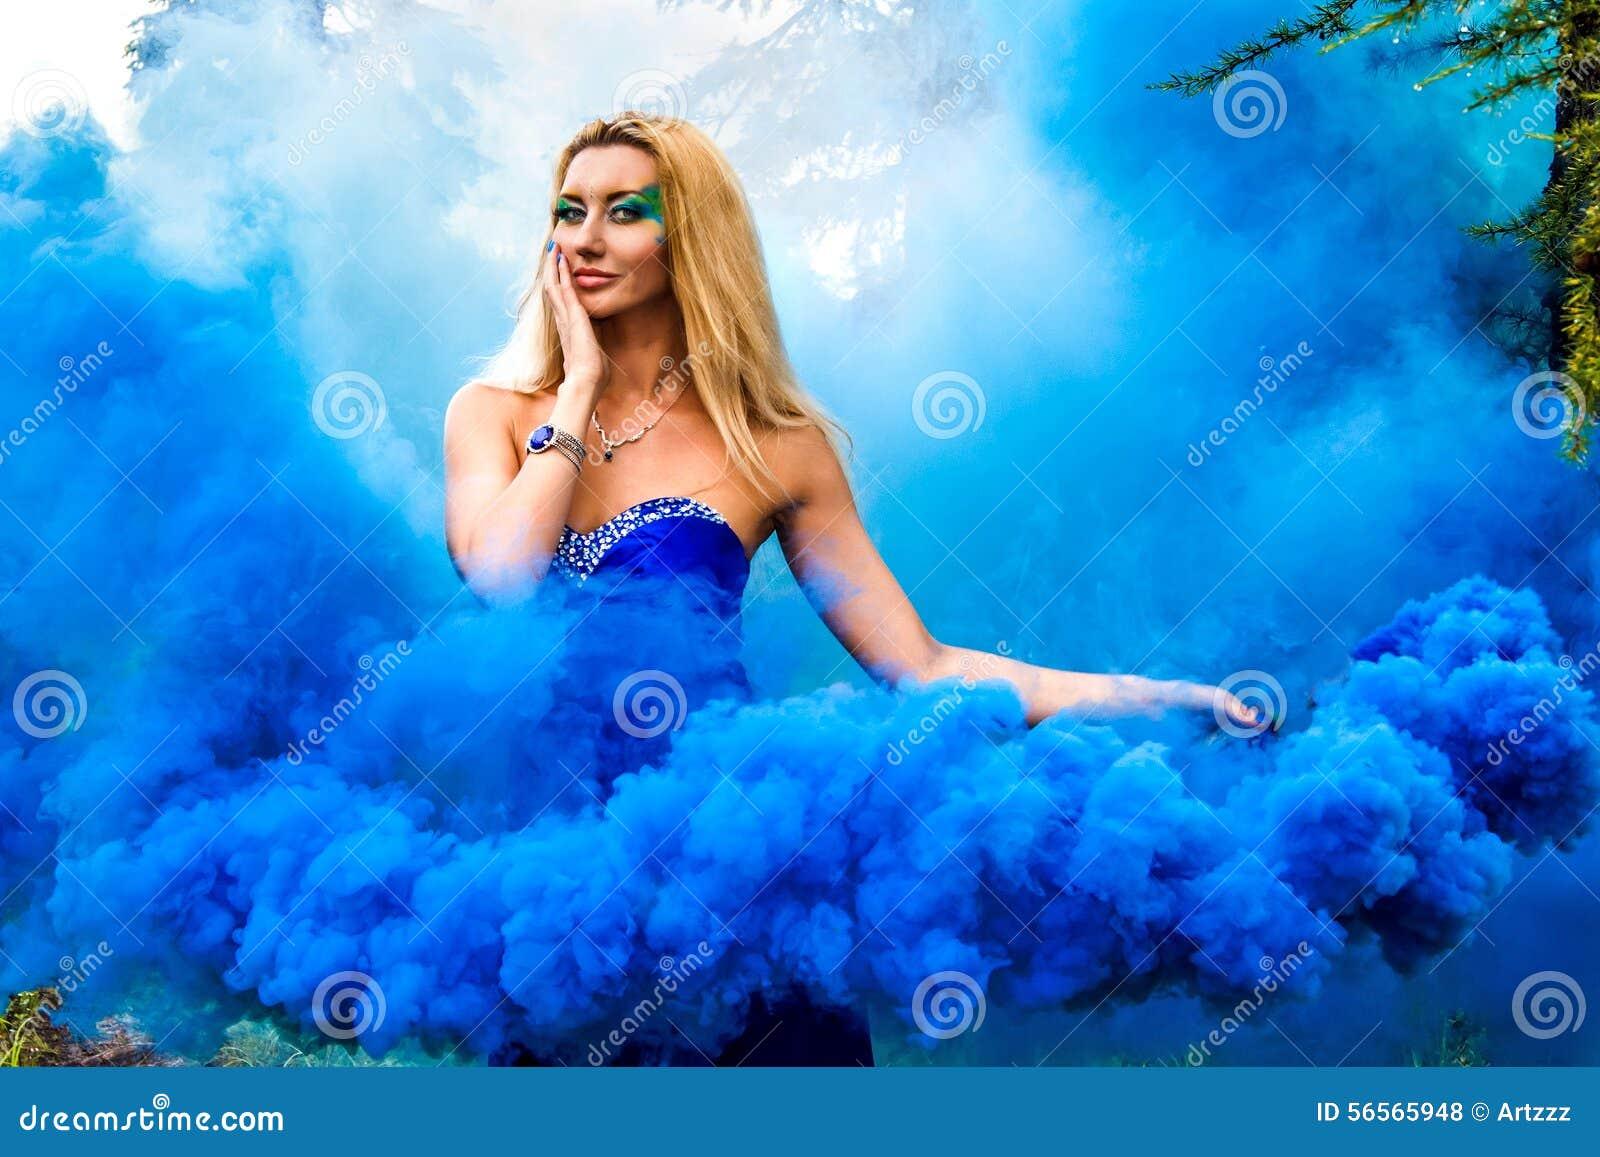 Download Όμορφη νέα γυναίκα σε ένα σύννεφο ενός φωτεινού μπλε καπνού Στοκ Εικόνες - εικόνα από υδρονέφωση, νεράιδα: 56565948